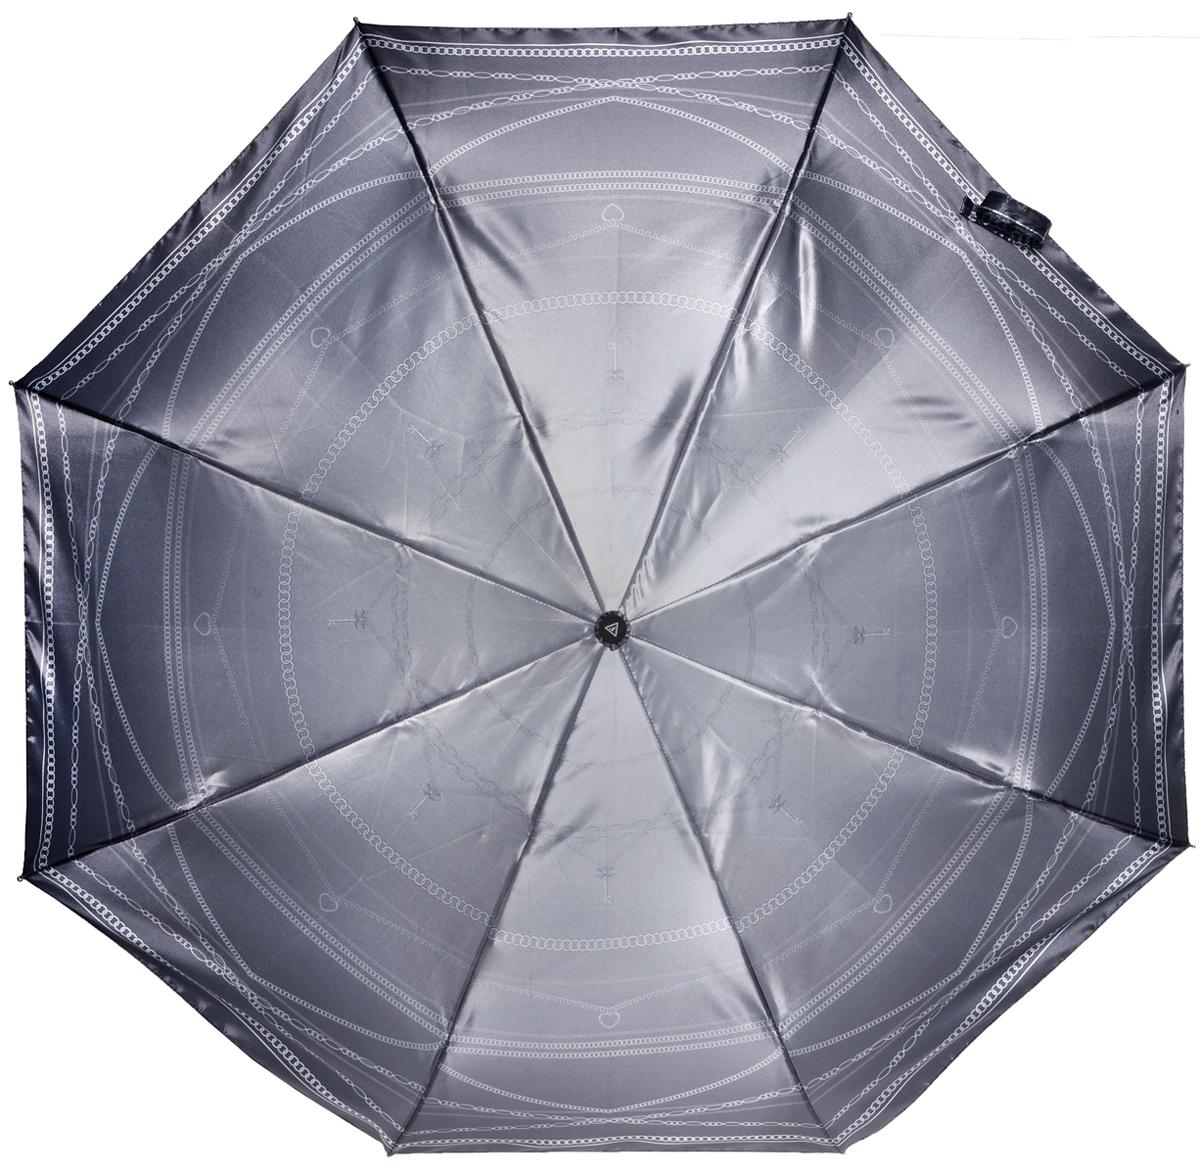 Зонт женский Fabretti, автомат, 3 сложения, цвет: серый. L-16106-15L-16106-15Зонт женский Fabretti, облегченный суперавтомат, 3 сложения